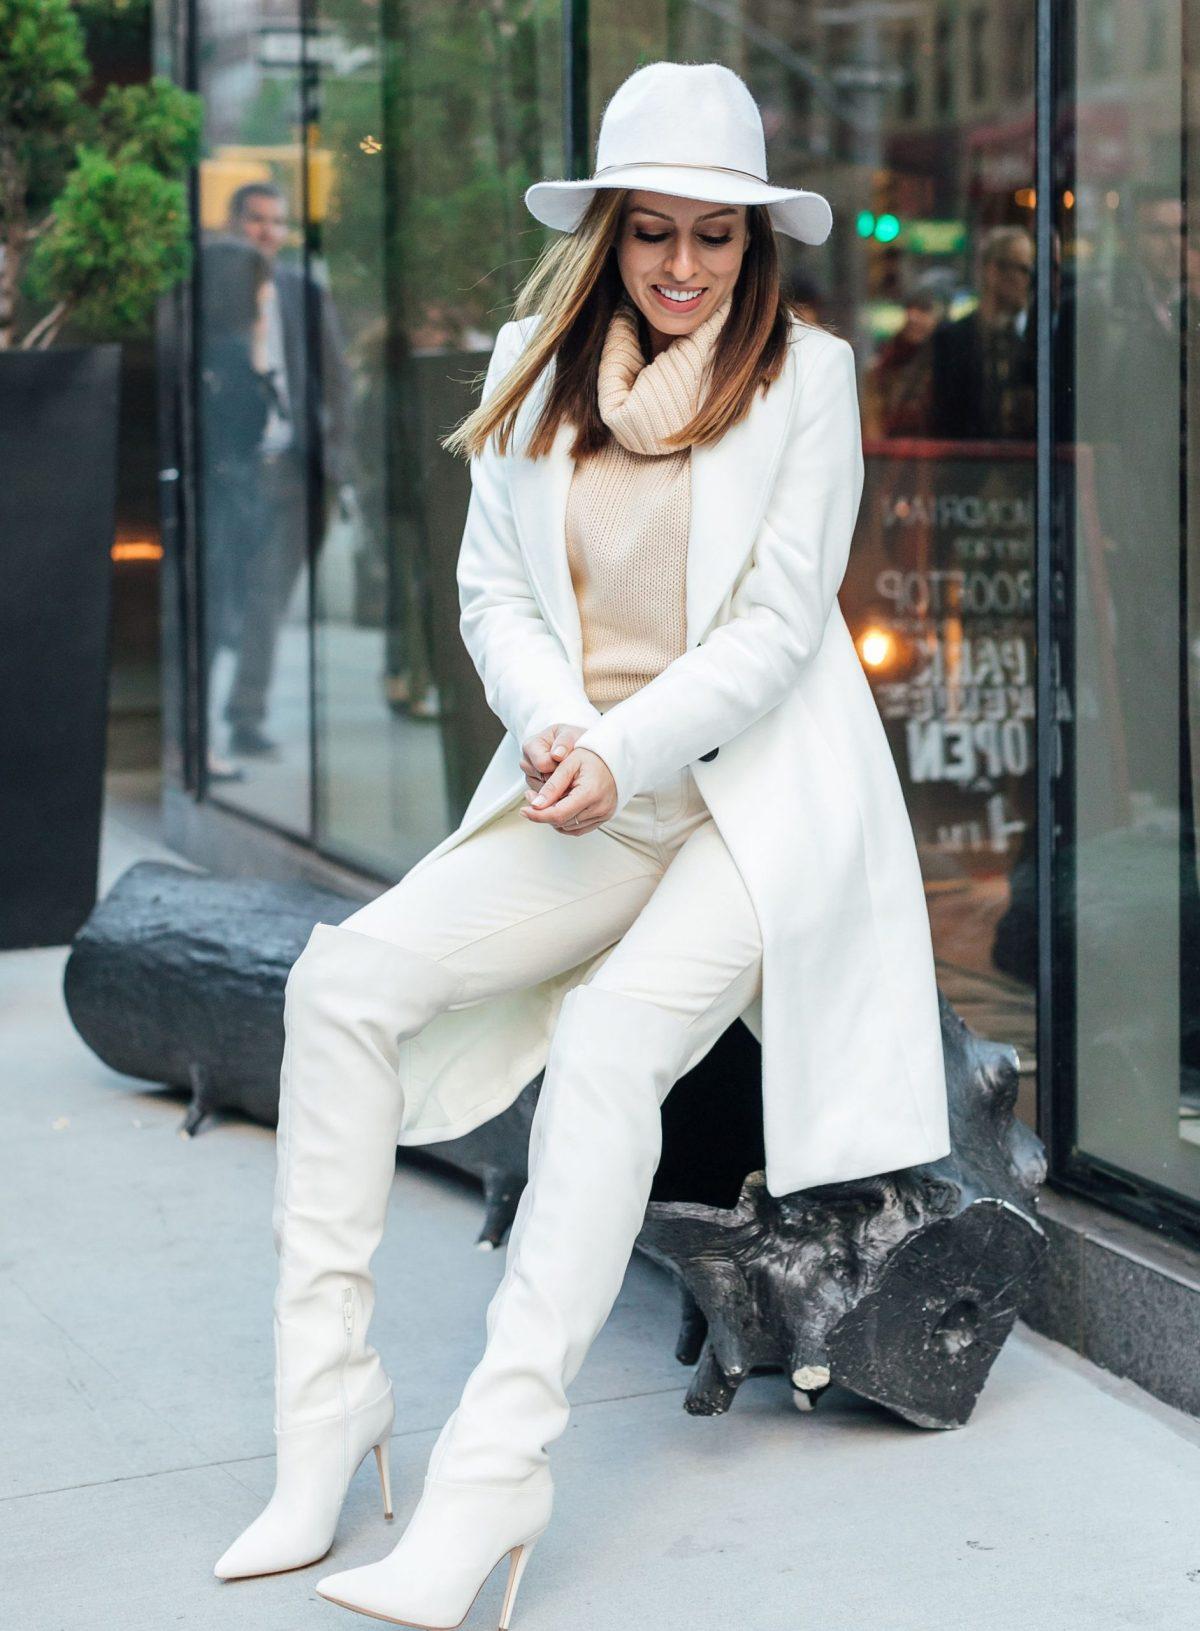 3 tips for wearing winter white sydne style